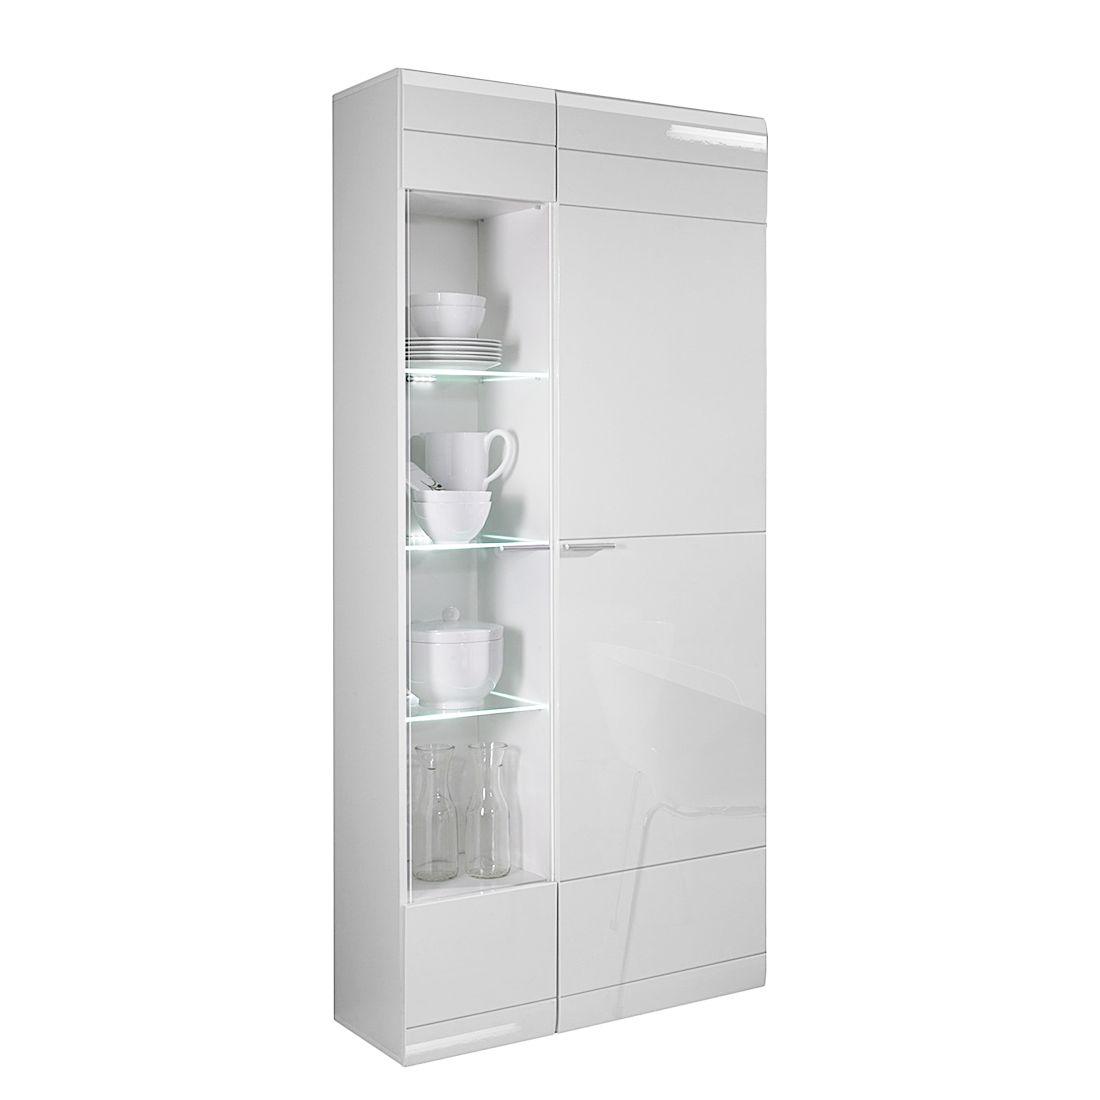 vitrine carero hochglanz wei t ranschlag rechts fredriks. Black Bedroom Furniture Sets. Home Design Ideas